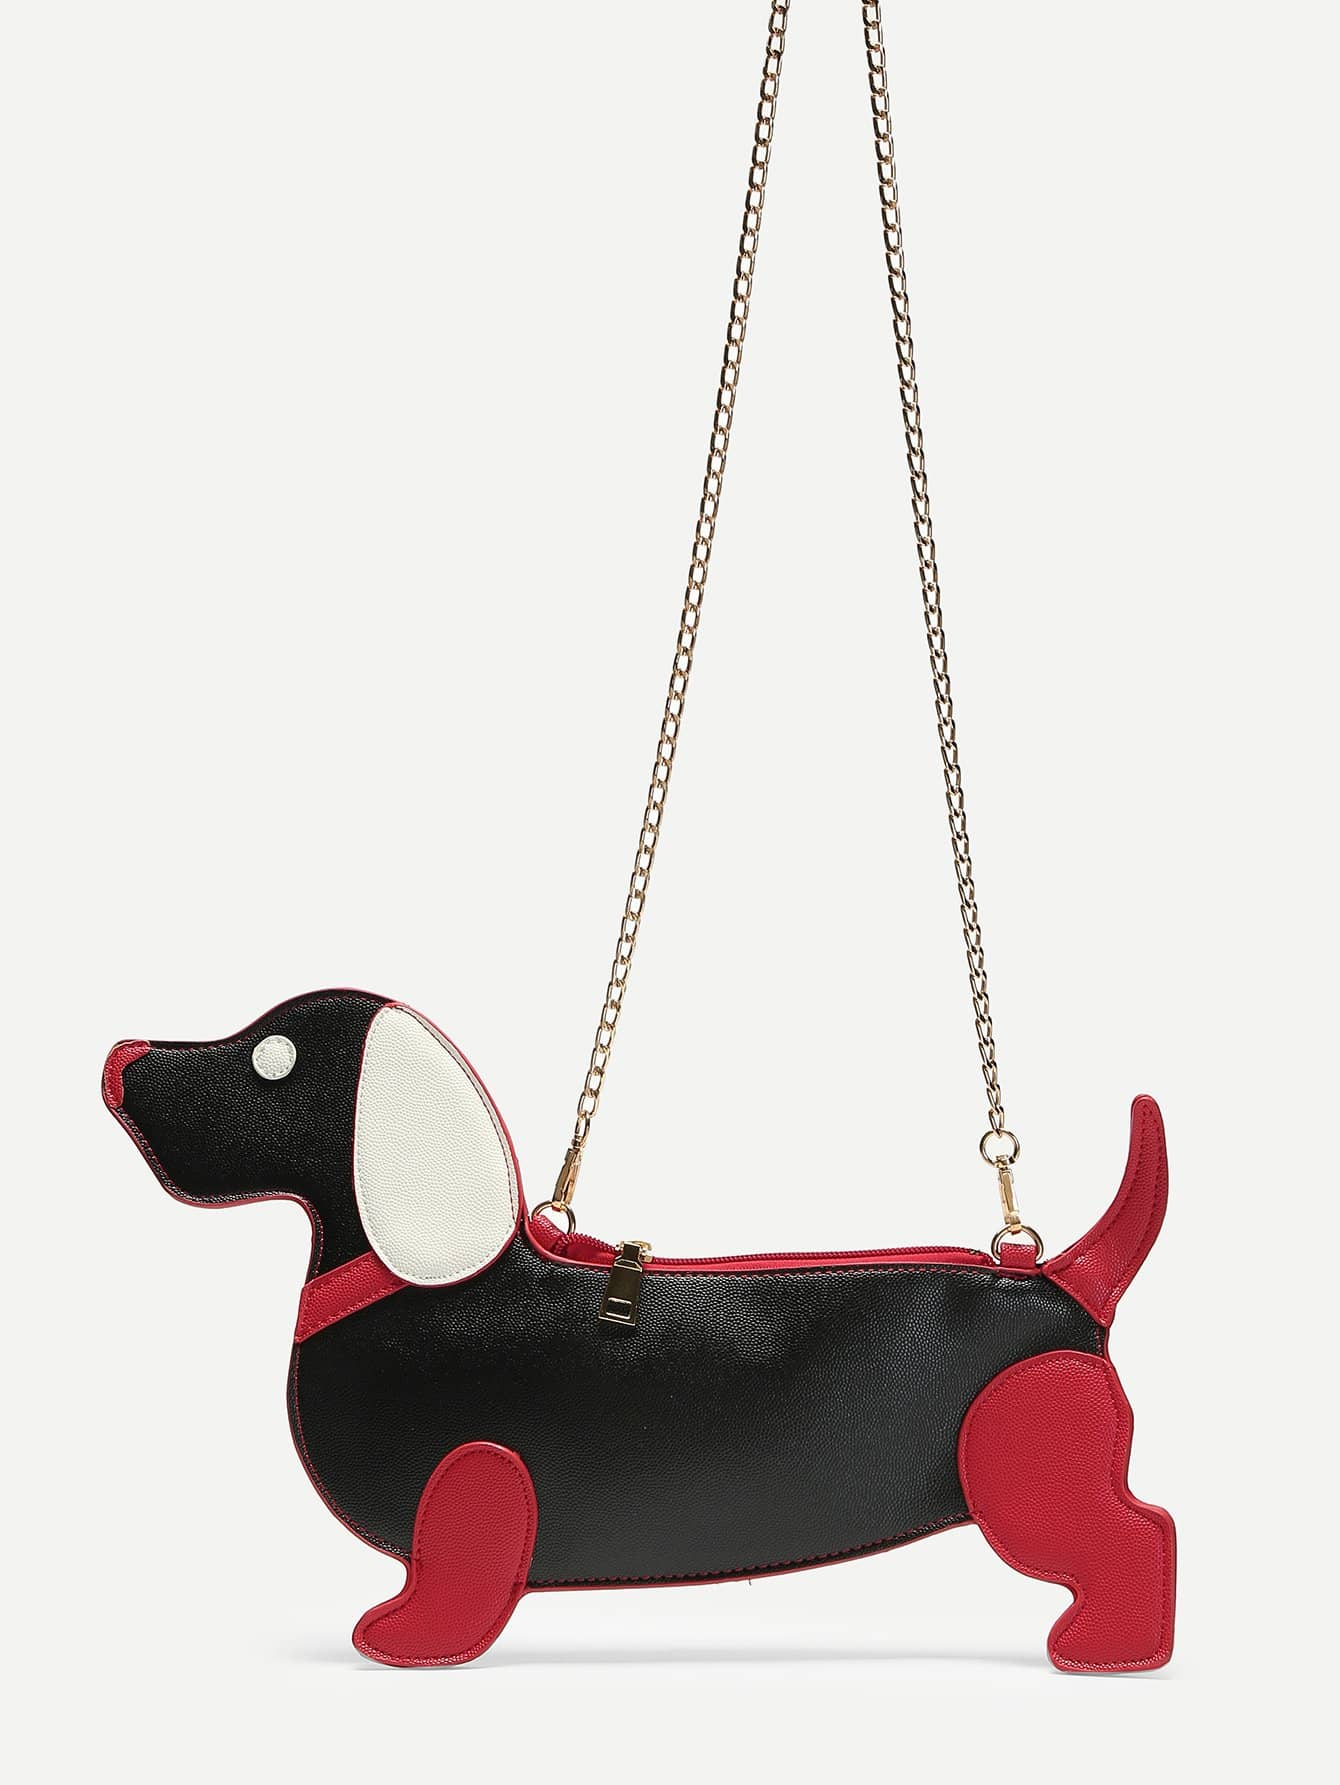 Animal Shaped Crossbody Chain Bag